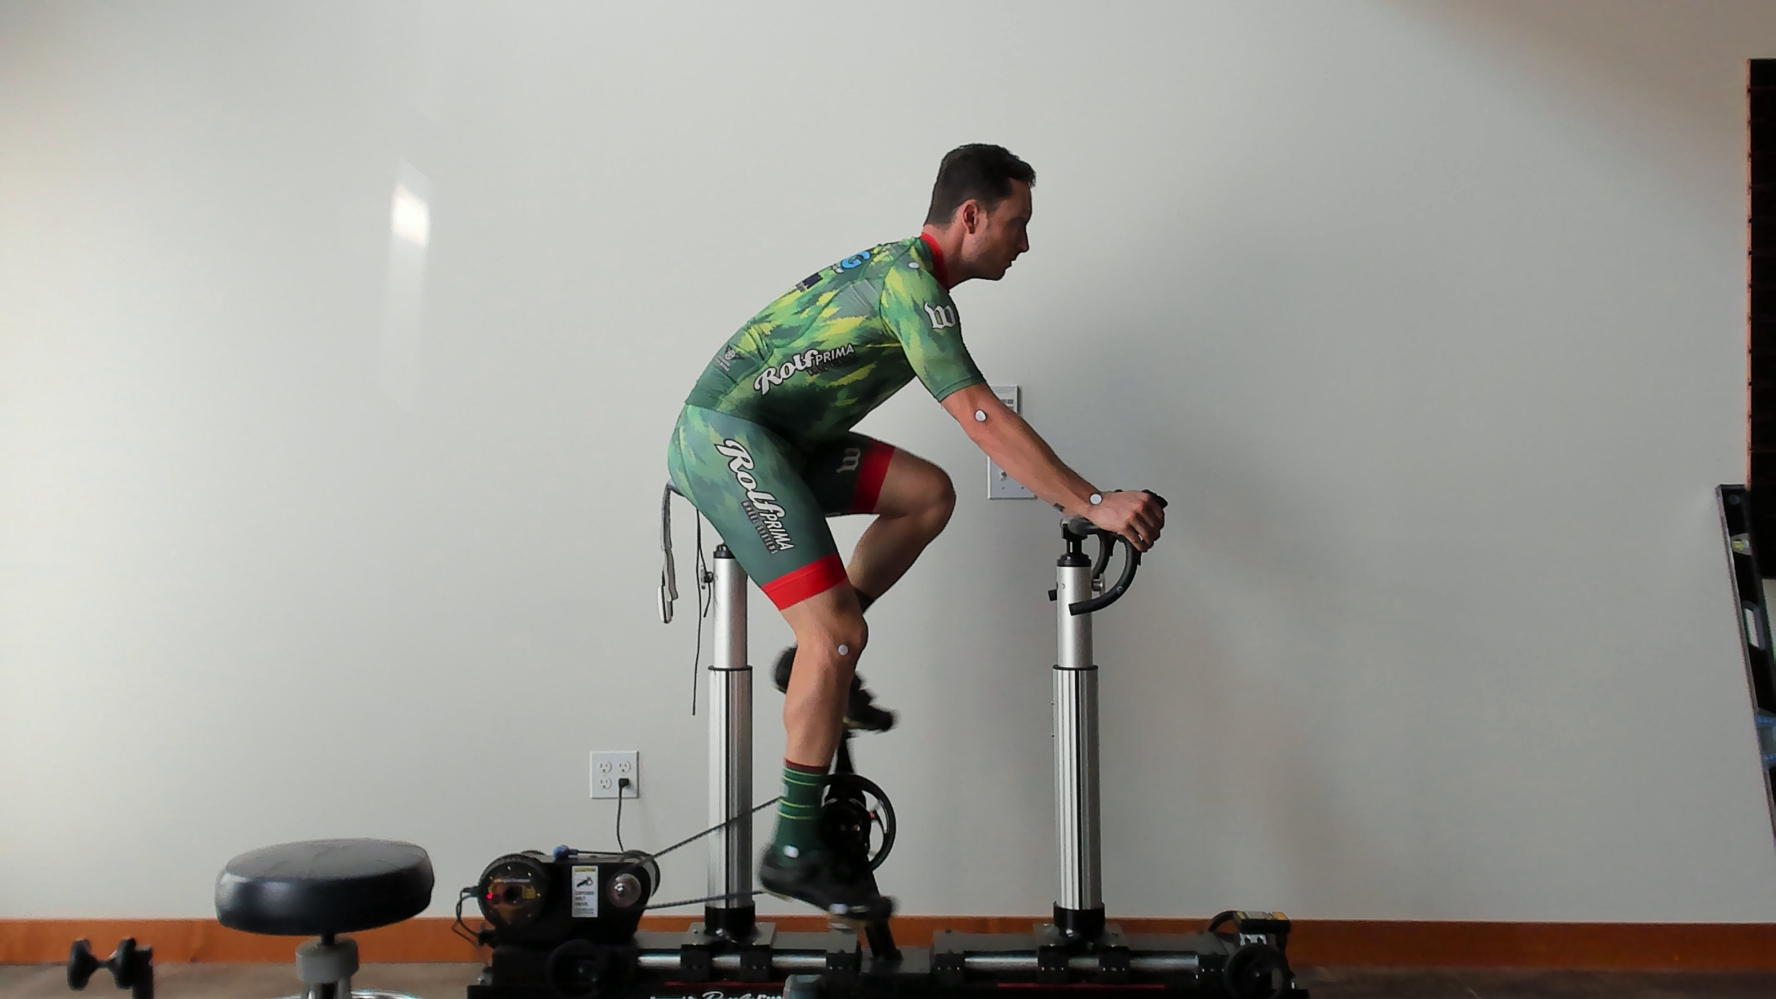 Sean's final cyclocross position